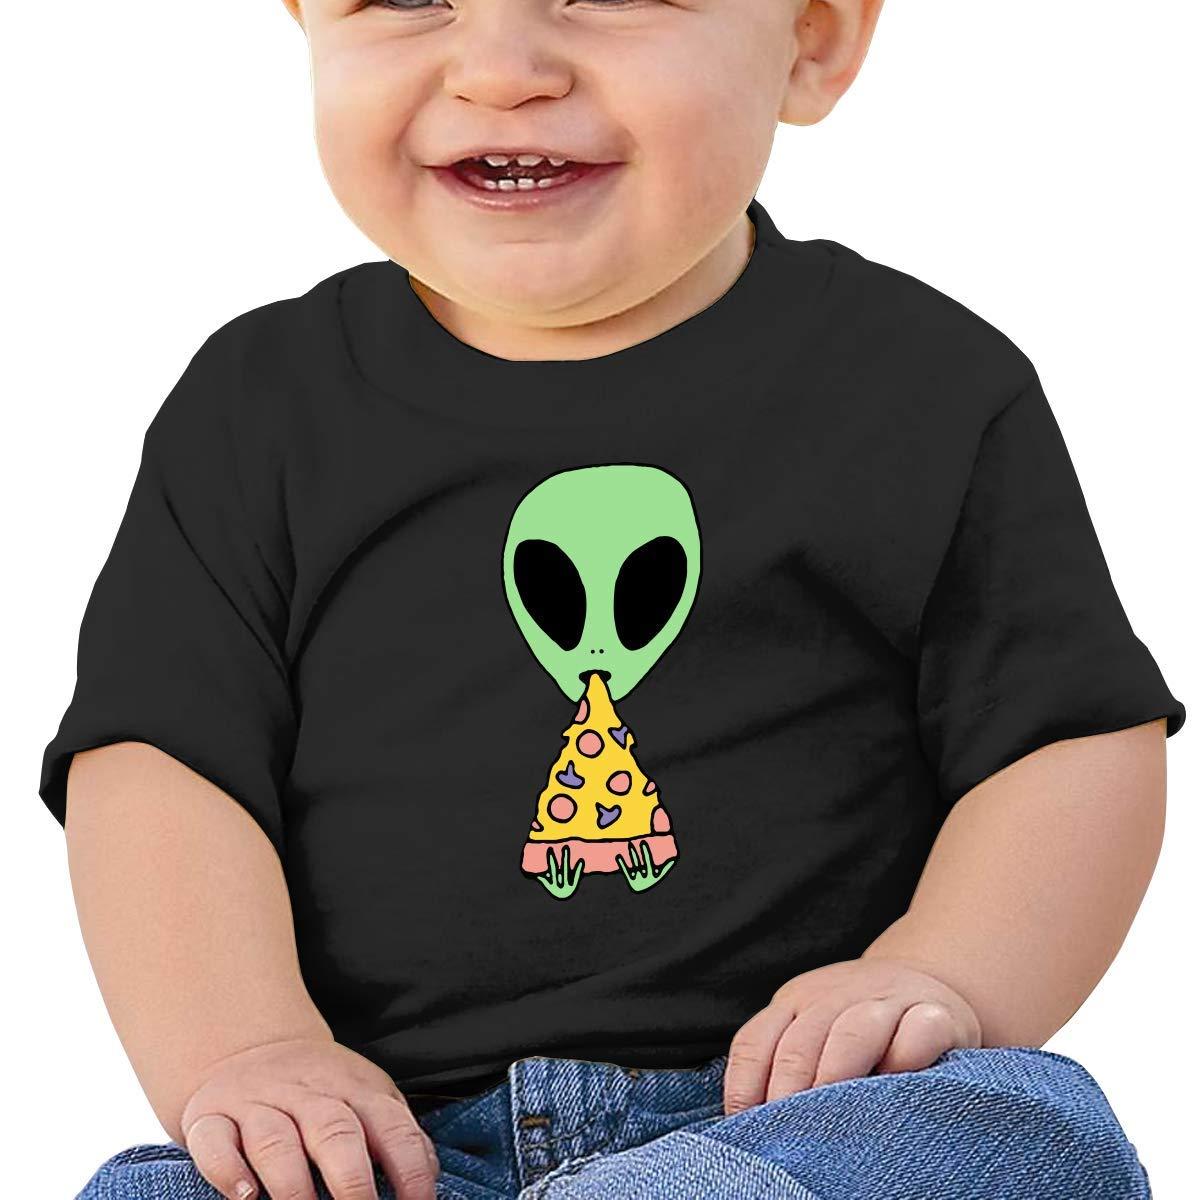 ZhuHanug Autism Awareness Flag Newborn Baby Short Sleeve Crew Neck T Shirts